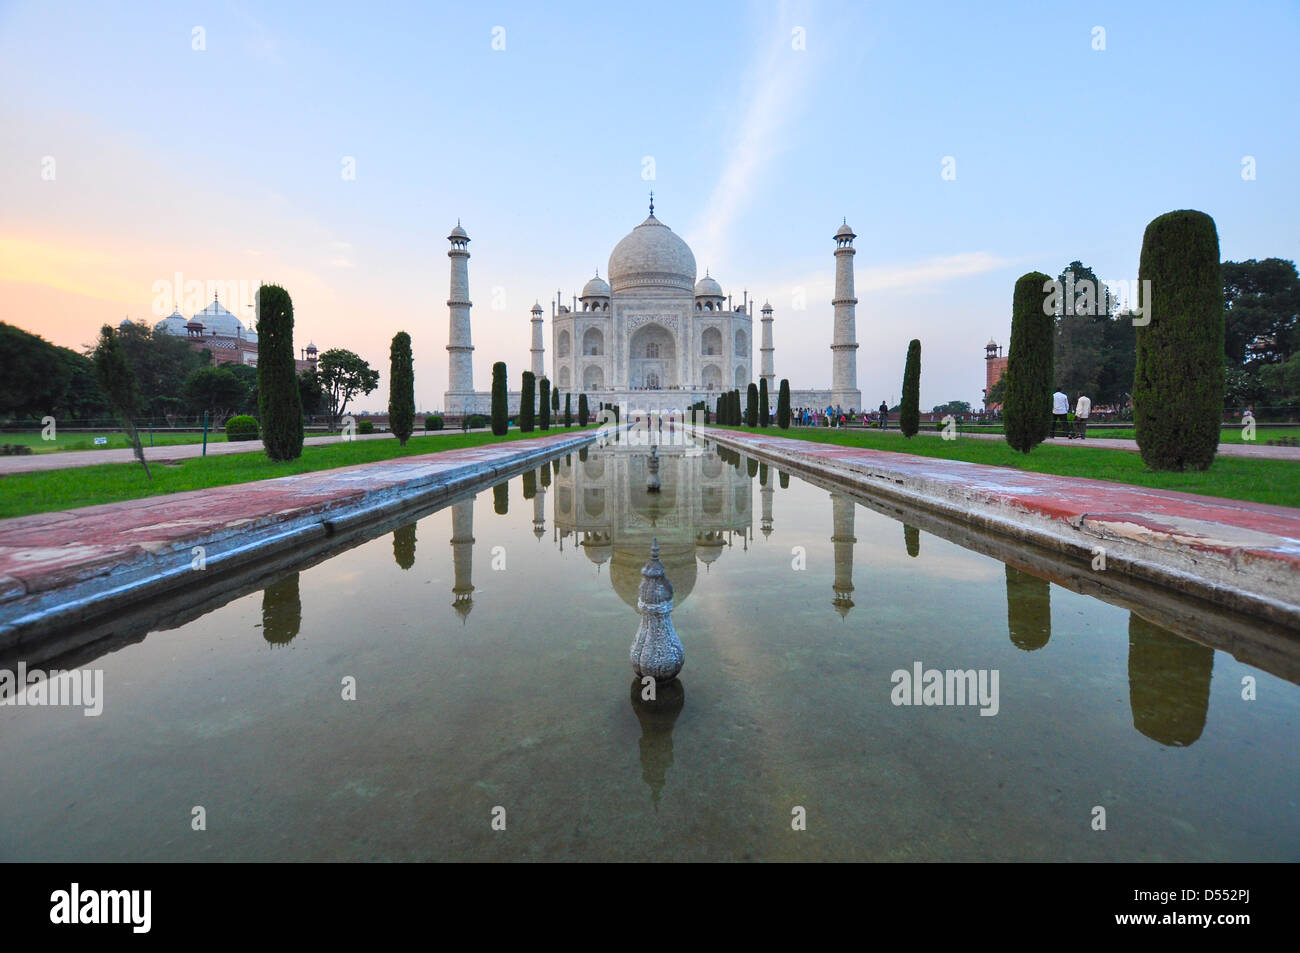 India, Uttar Pradesh, Agra, il Taj Mahal Immagini Stock